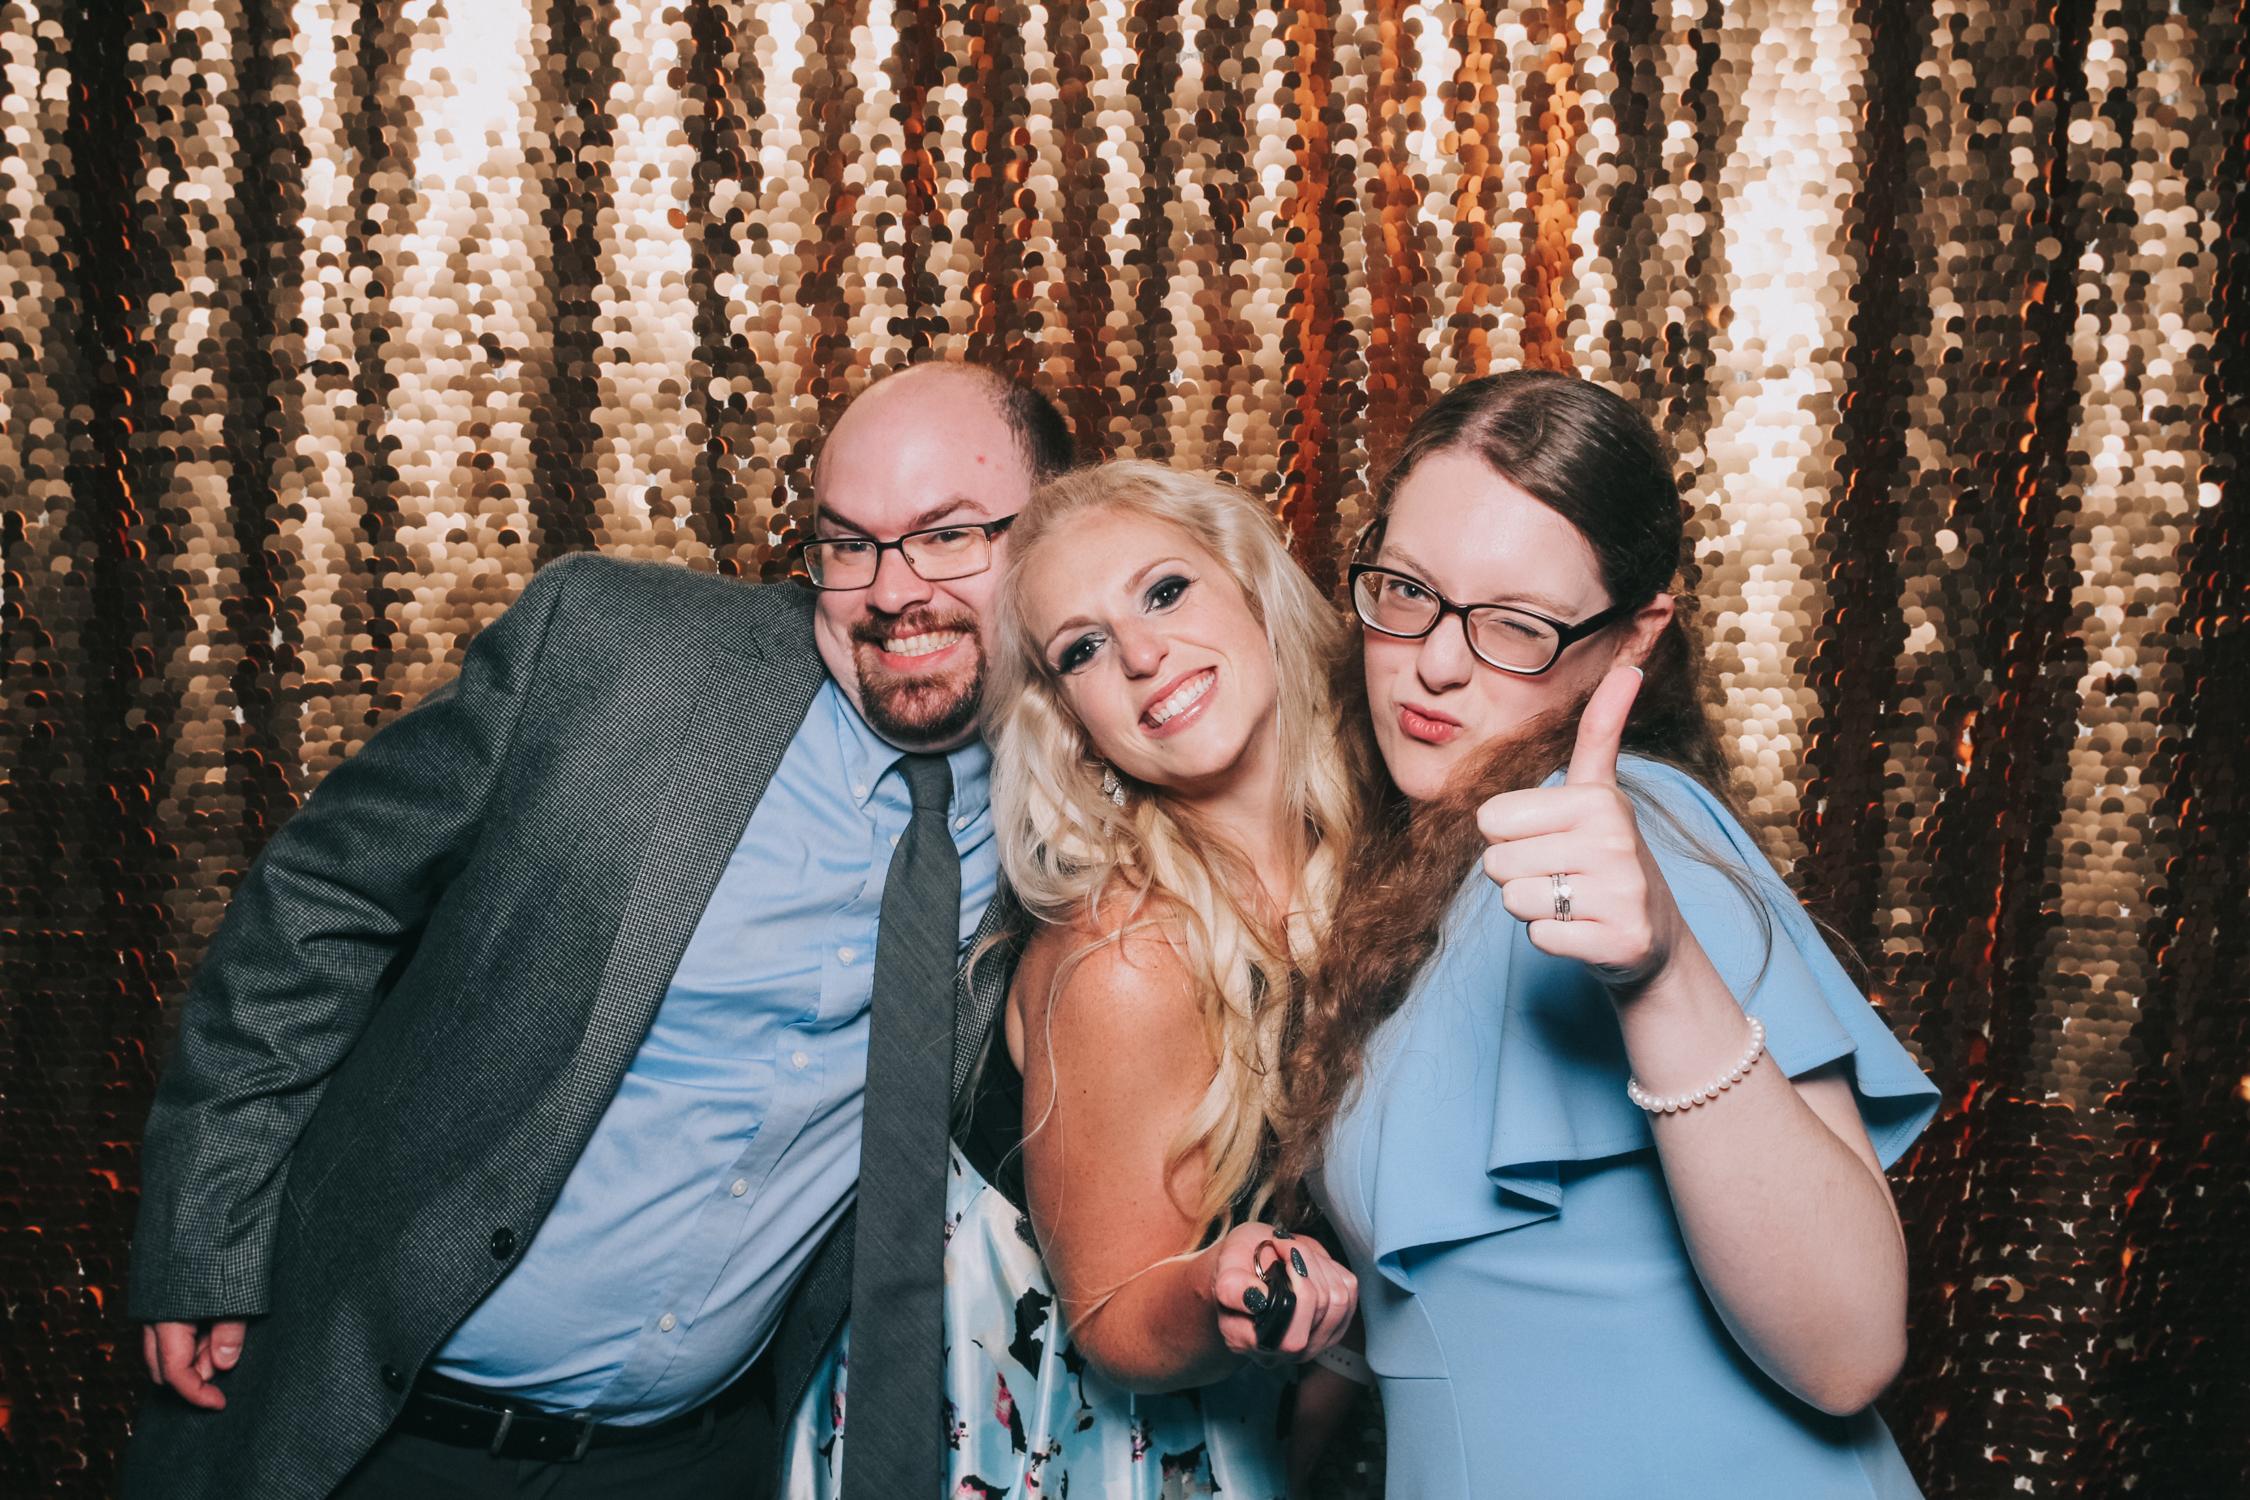 baltimore rusty scupper wedding photo booth-32.jpg